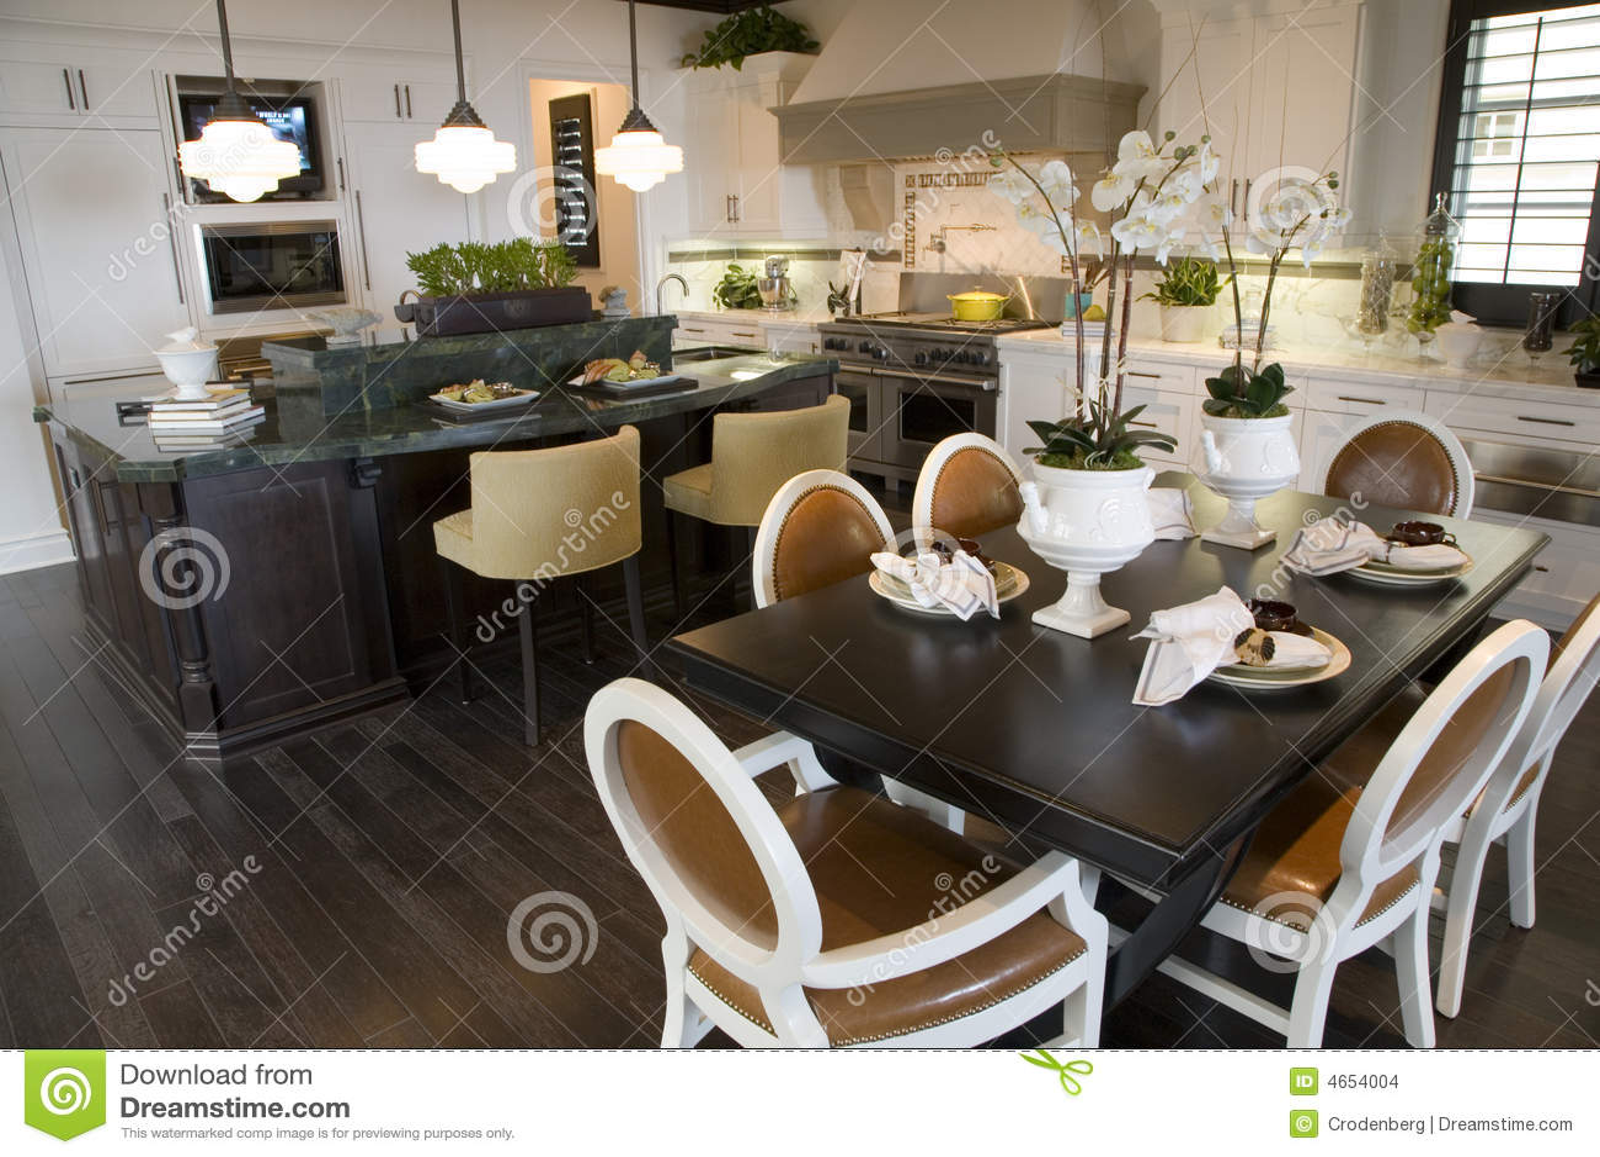 mobile home kitchens cheap kitchen faucets 早餐家庭豪华表库存照片 图片包括有庄园 枝形吊灯 设计员 里面 内部 早餐家庭豪华表